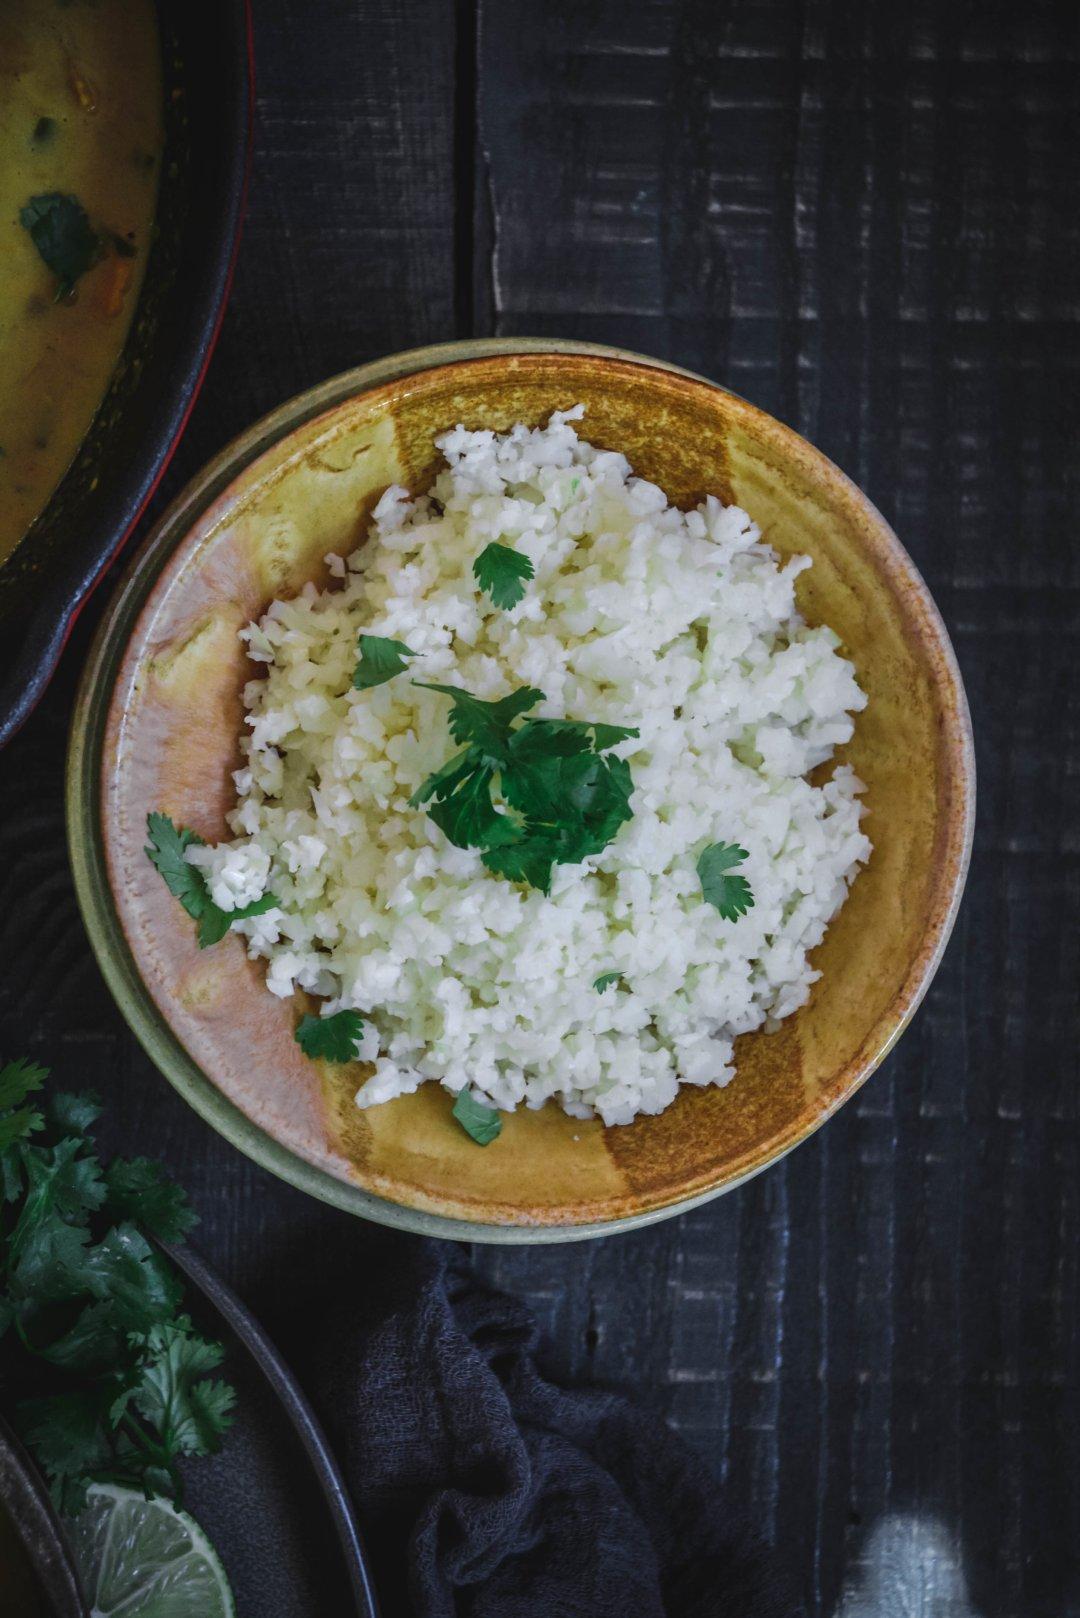 Cauliflower rice in bowl